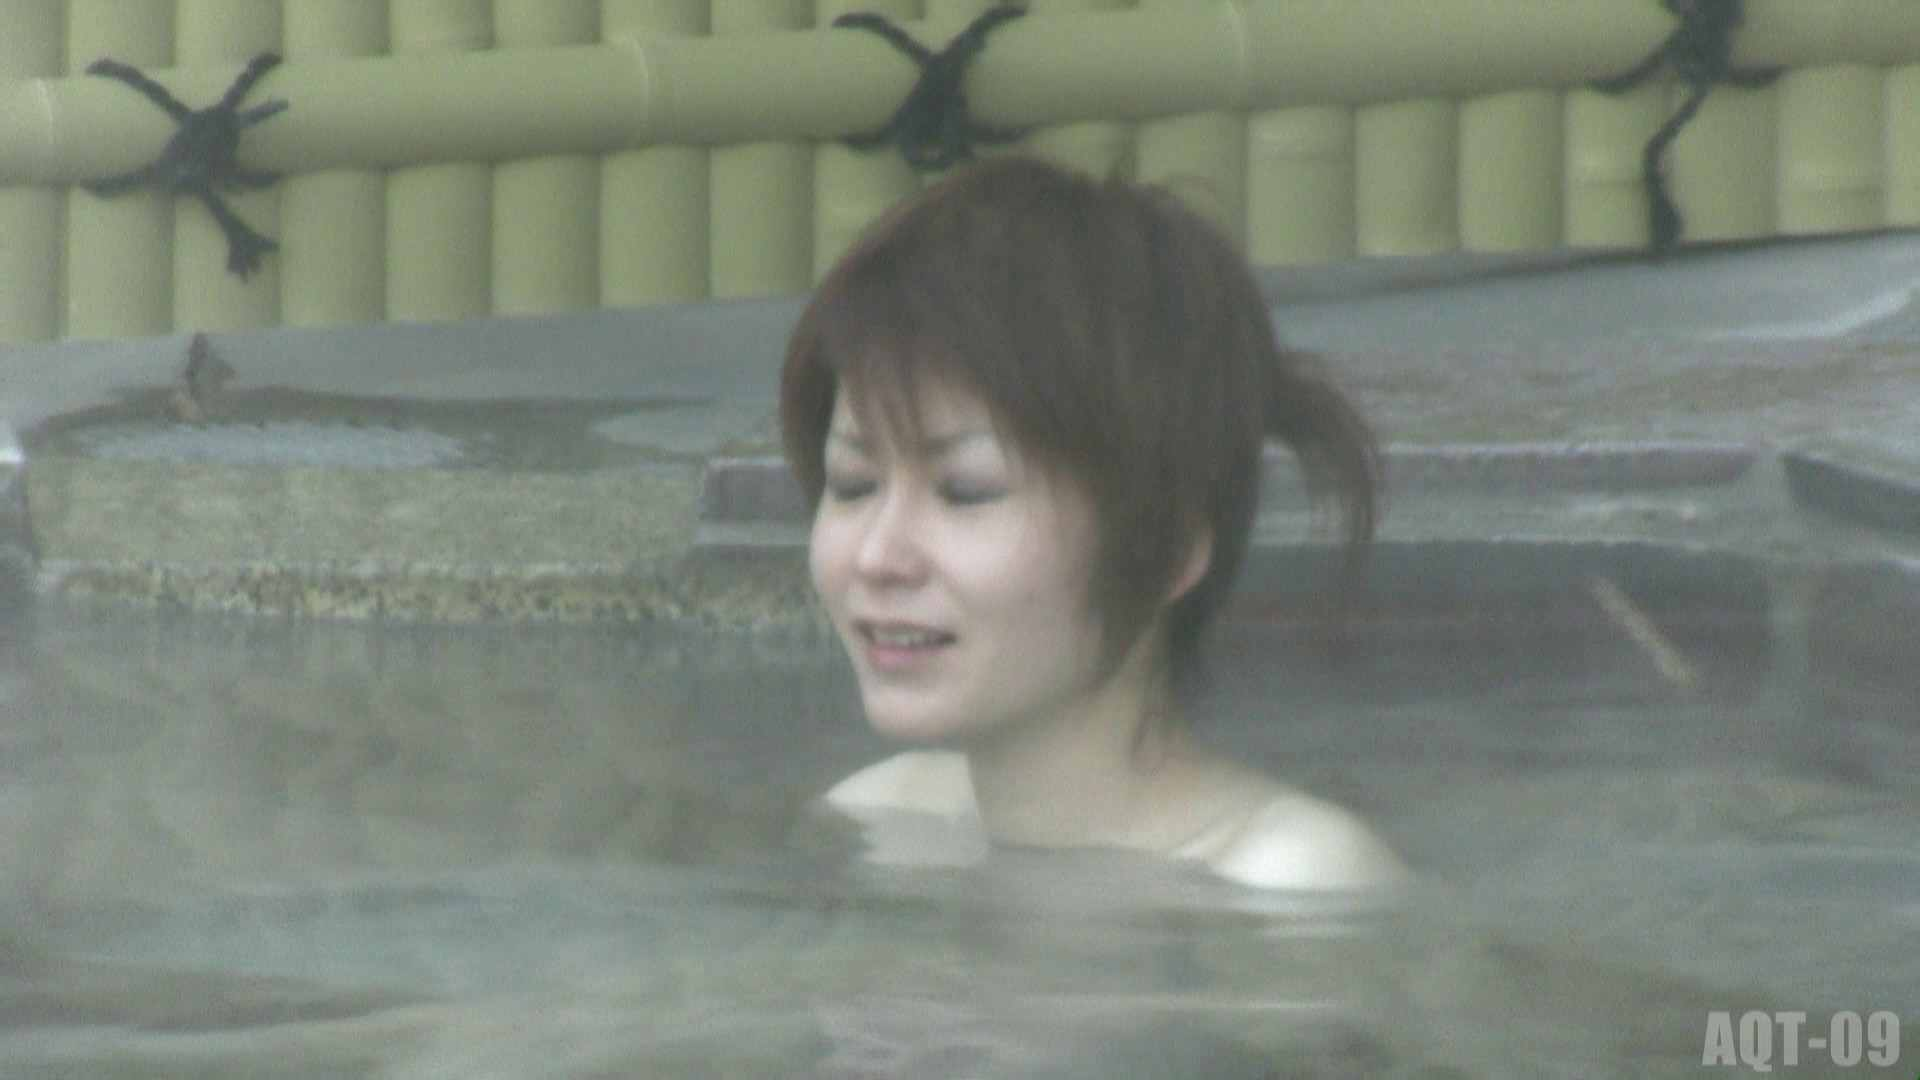 Aquaな露天風呂Vol.779 露天風呂編  99PIX 2